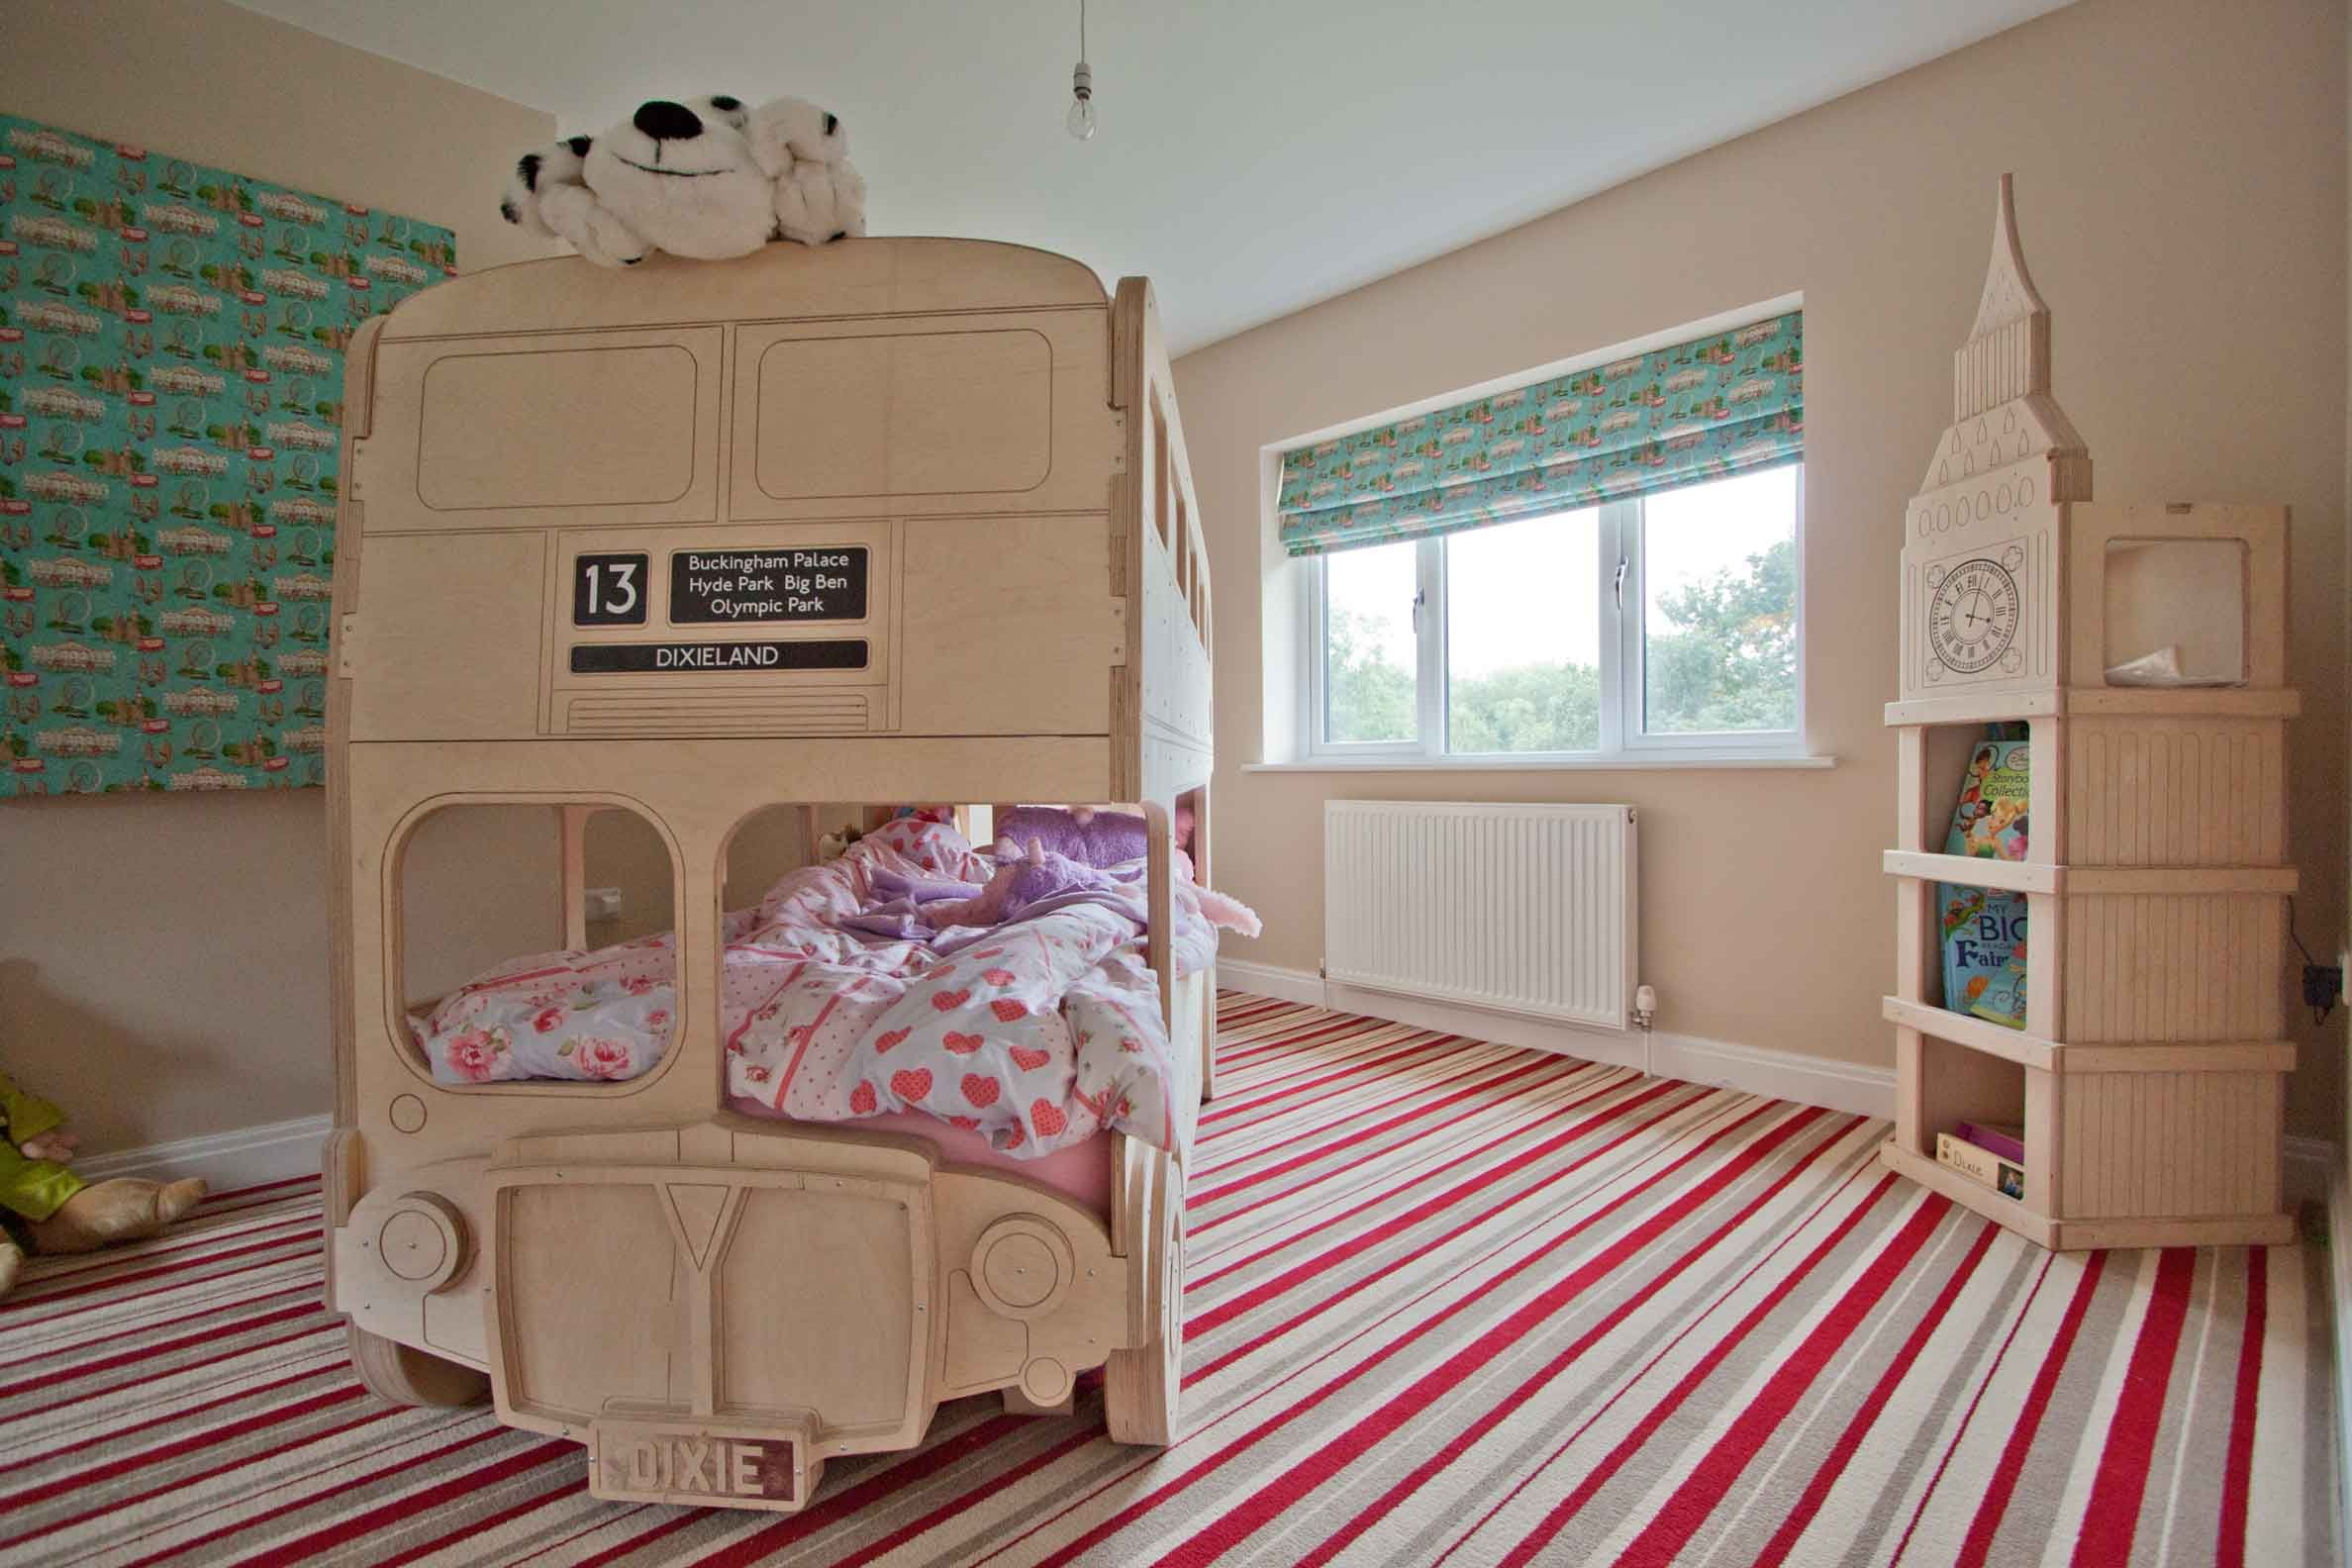 Etagenbett London Bus : London routemaster bus bunk bed and big ben storage unit in situ